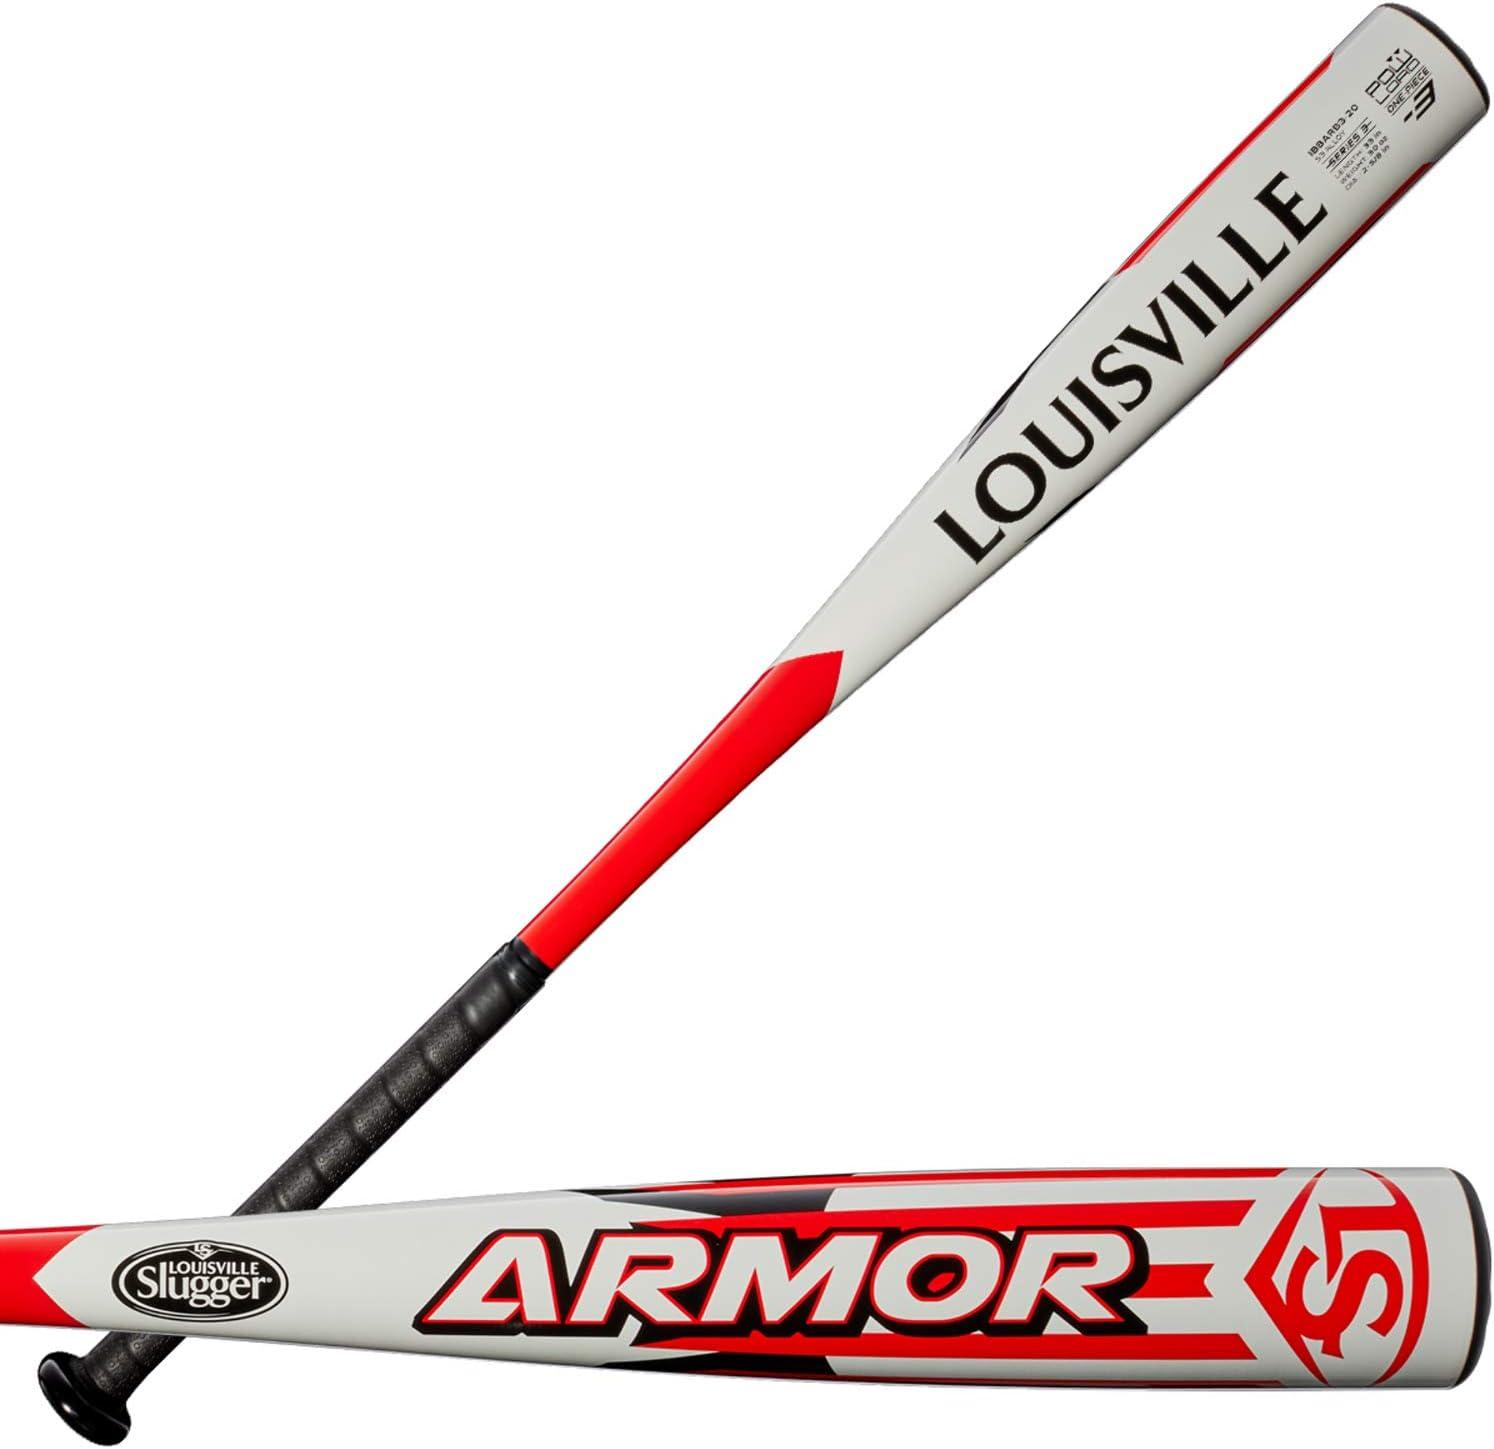 Wilson Bate de B/éisbol Dise/ño de Una Pieza Aluminio LS Armor Louiseville Slugger